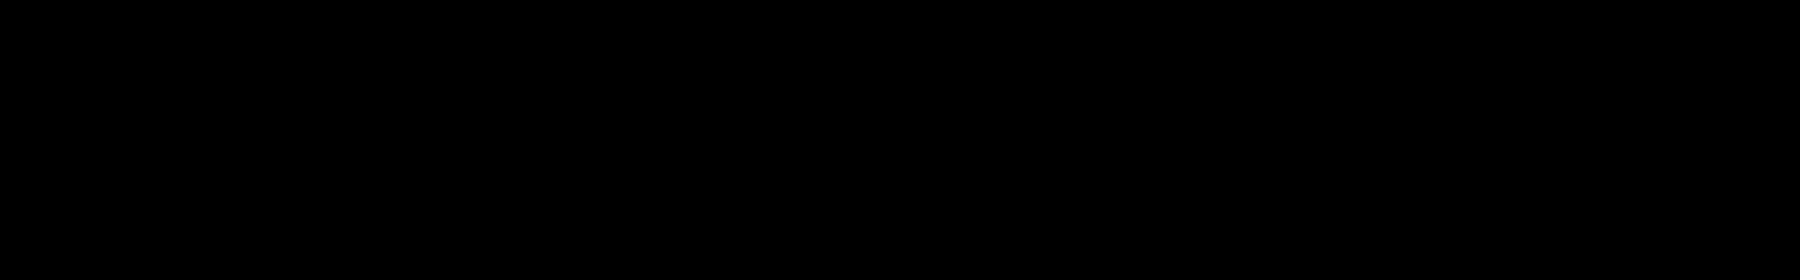 HYDRUS audio waveform